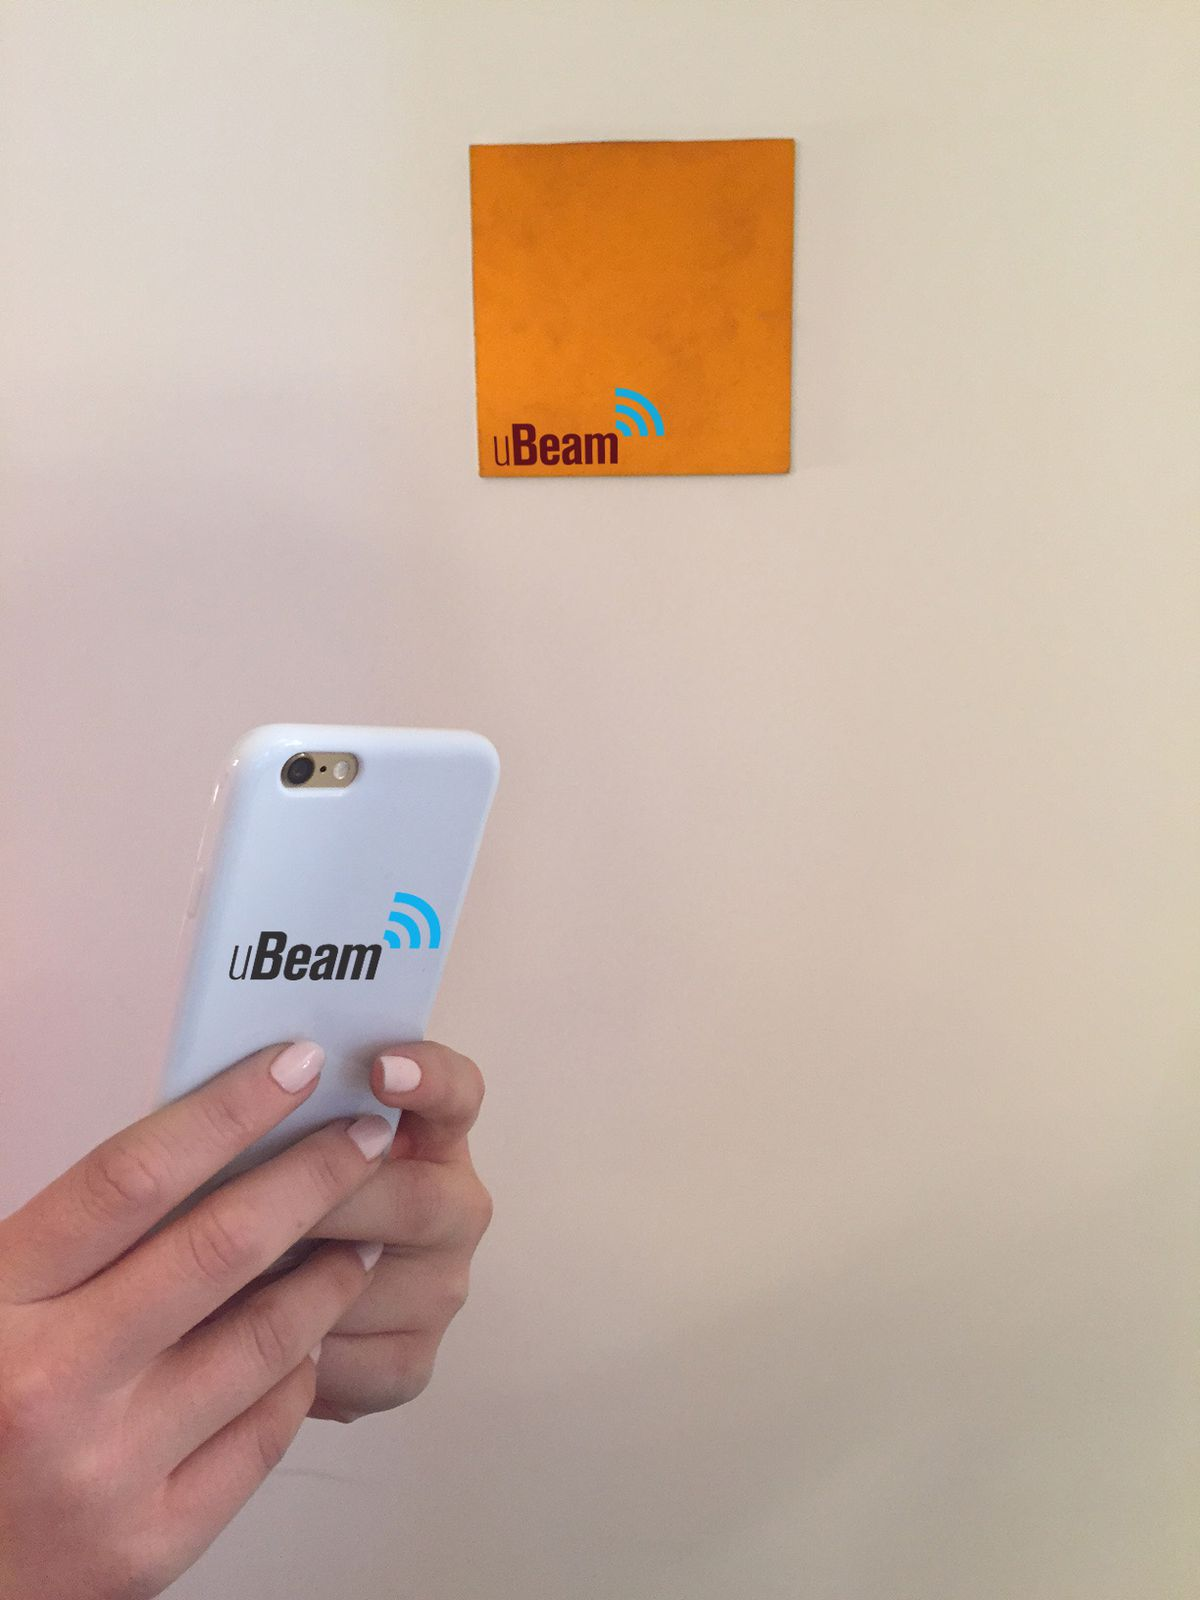 uBeam prototype